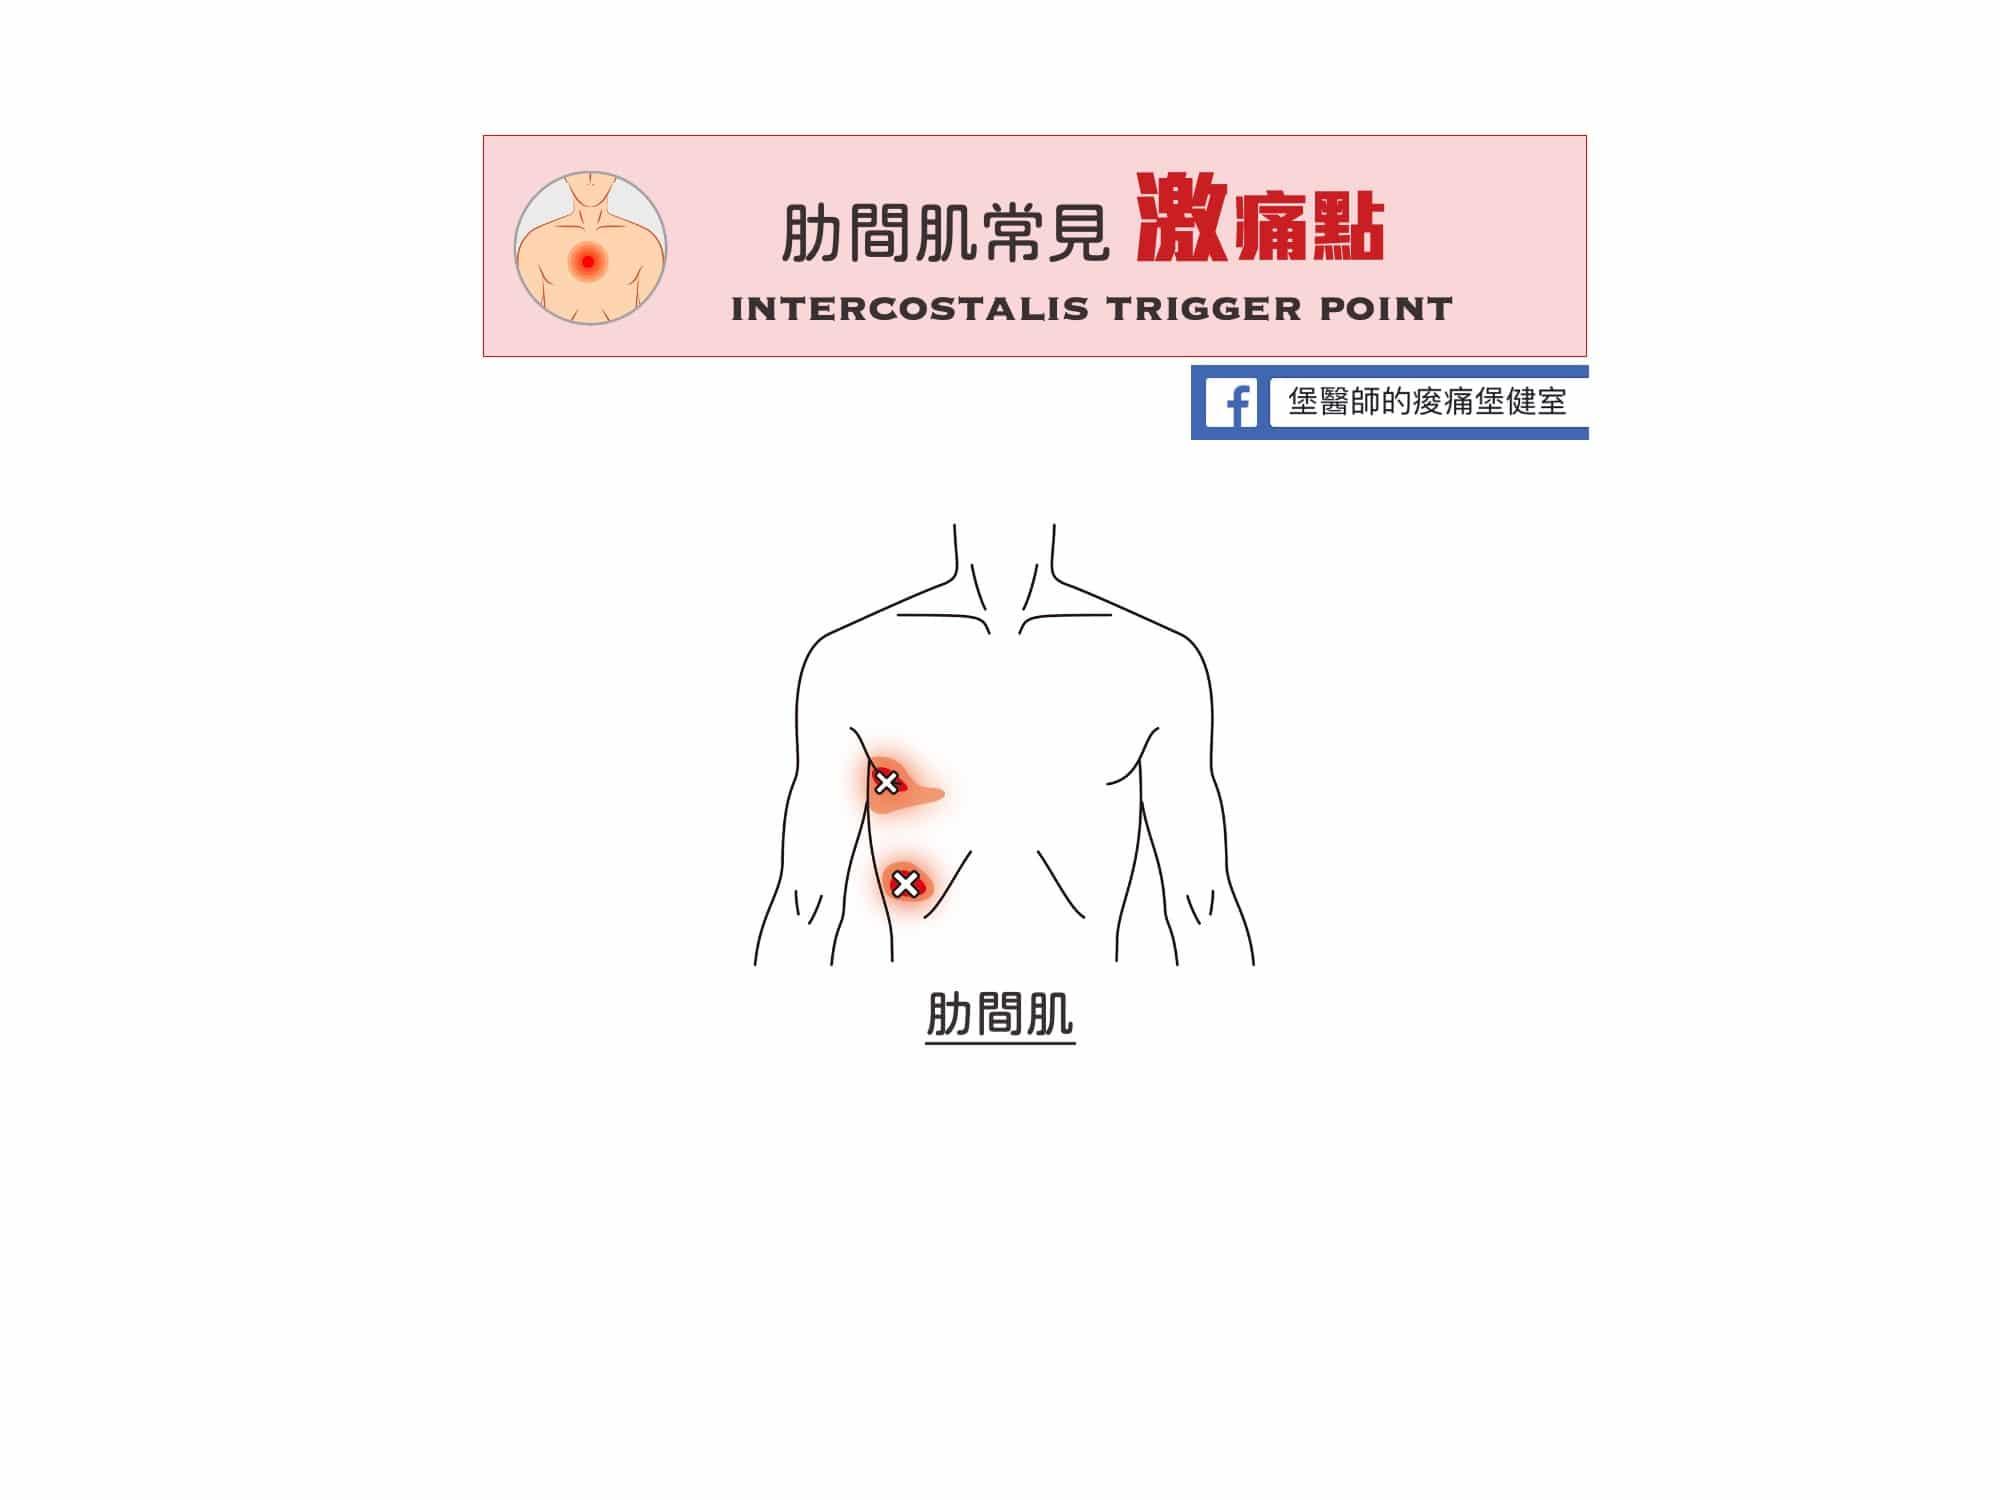 胸痛-肋間肌常見激痛點